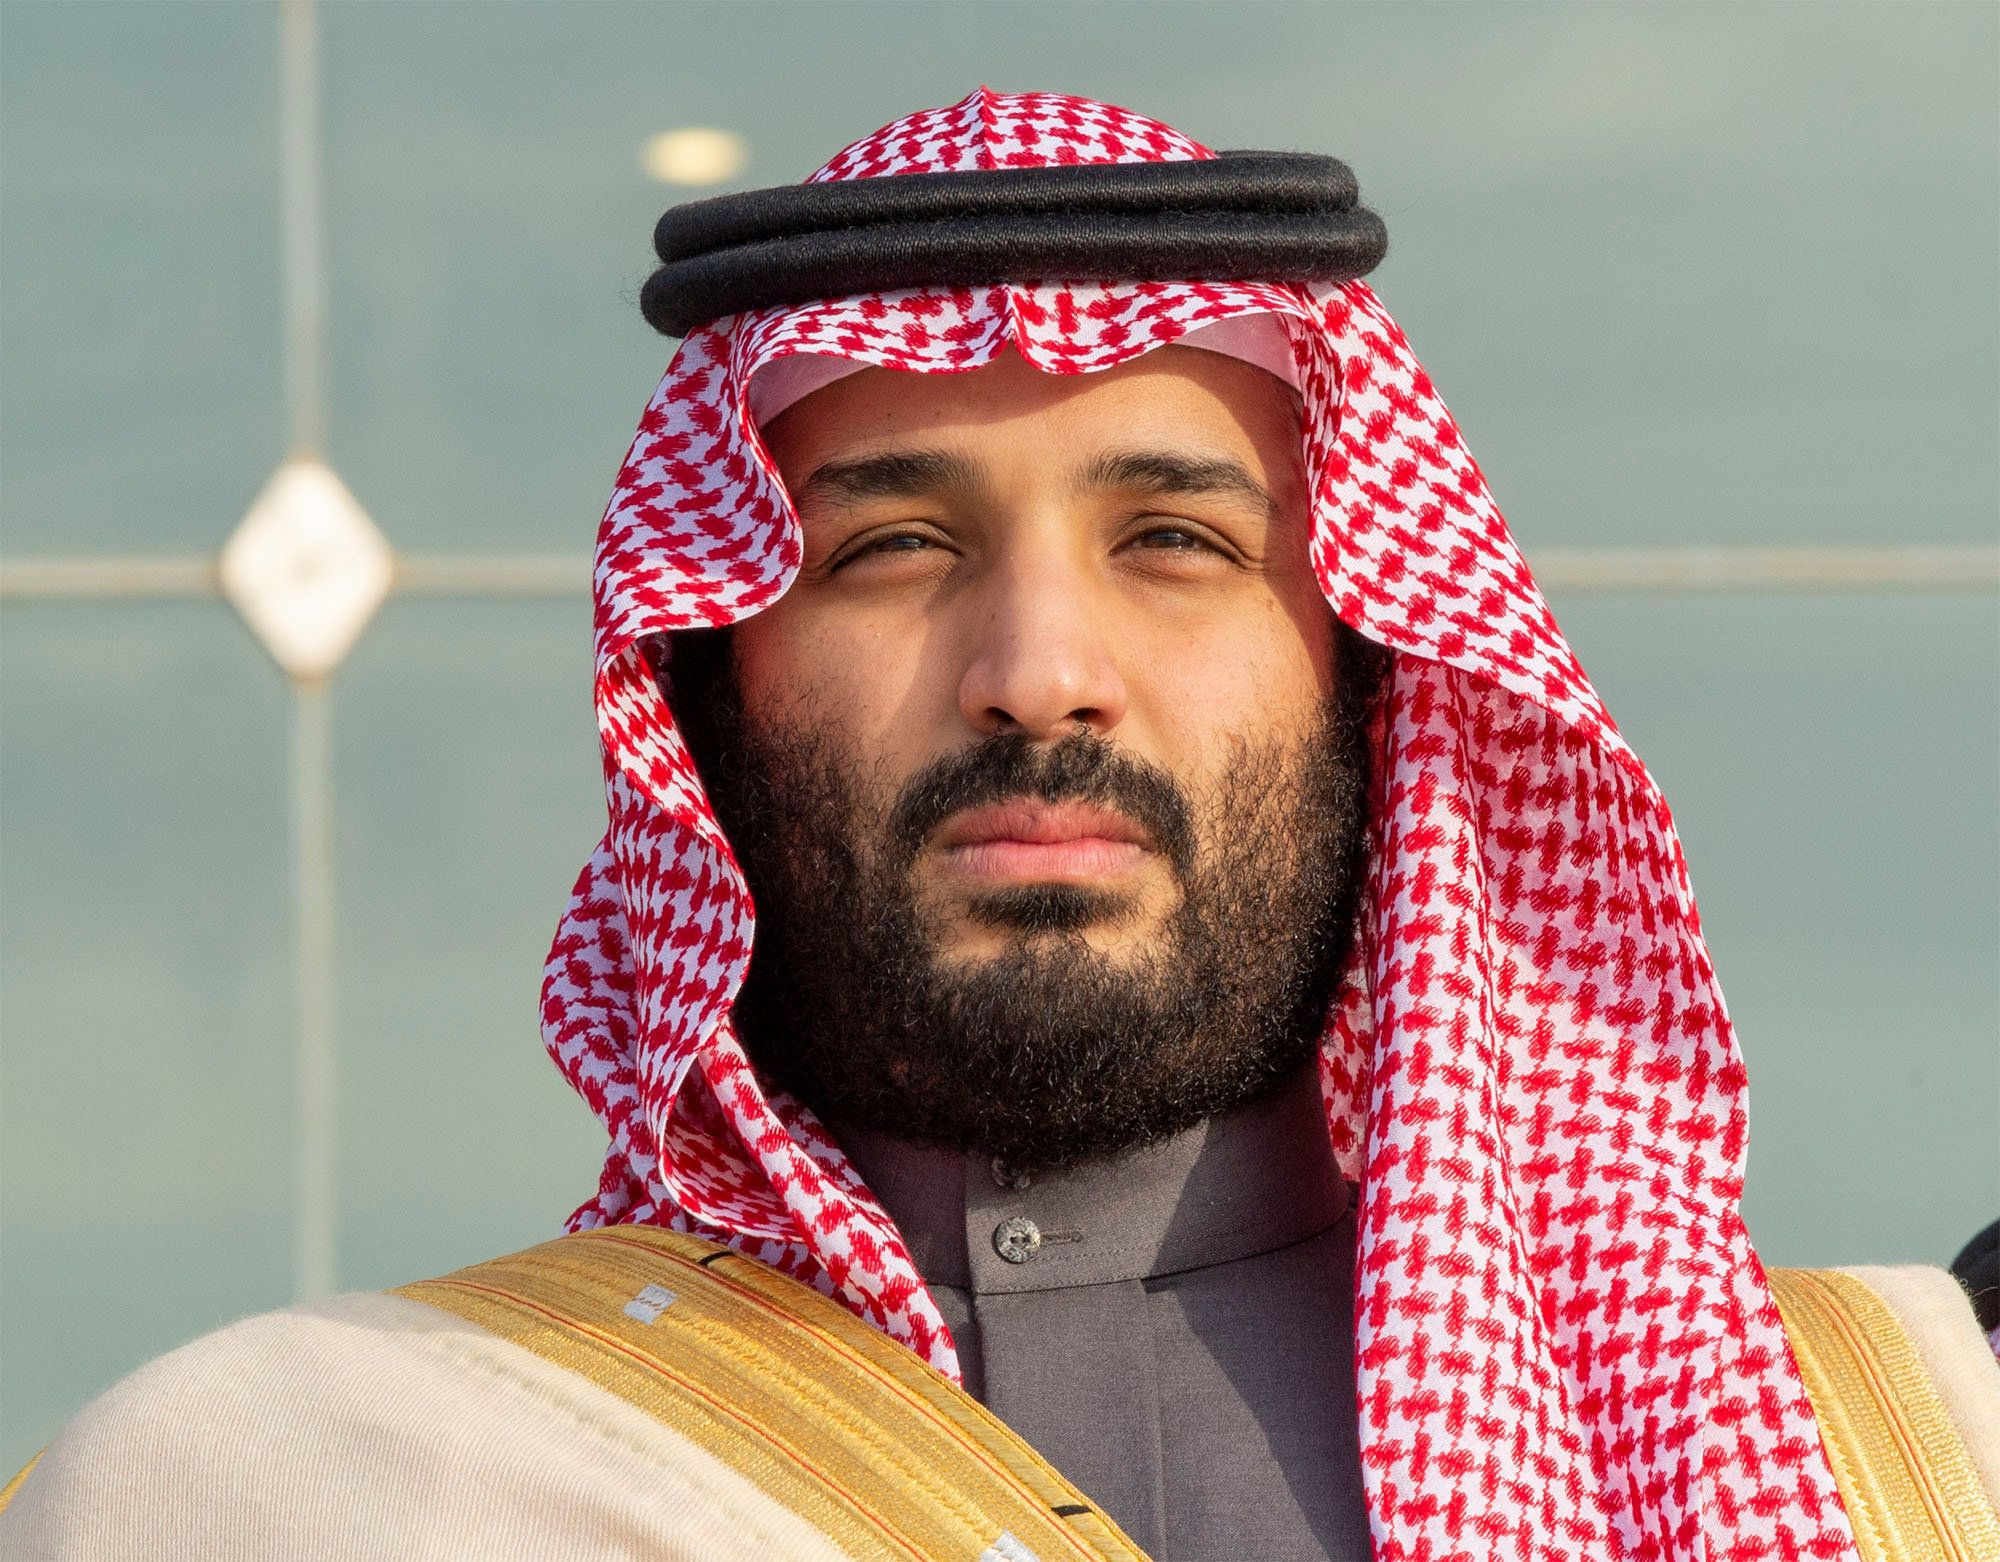 A file image of Saudi Arabia's Crown Prince Mohammed bin